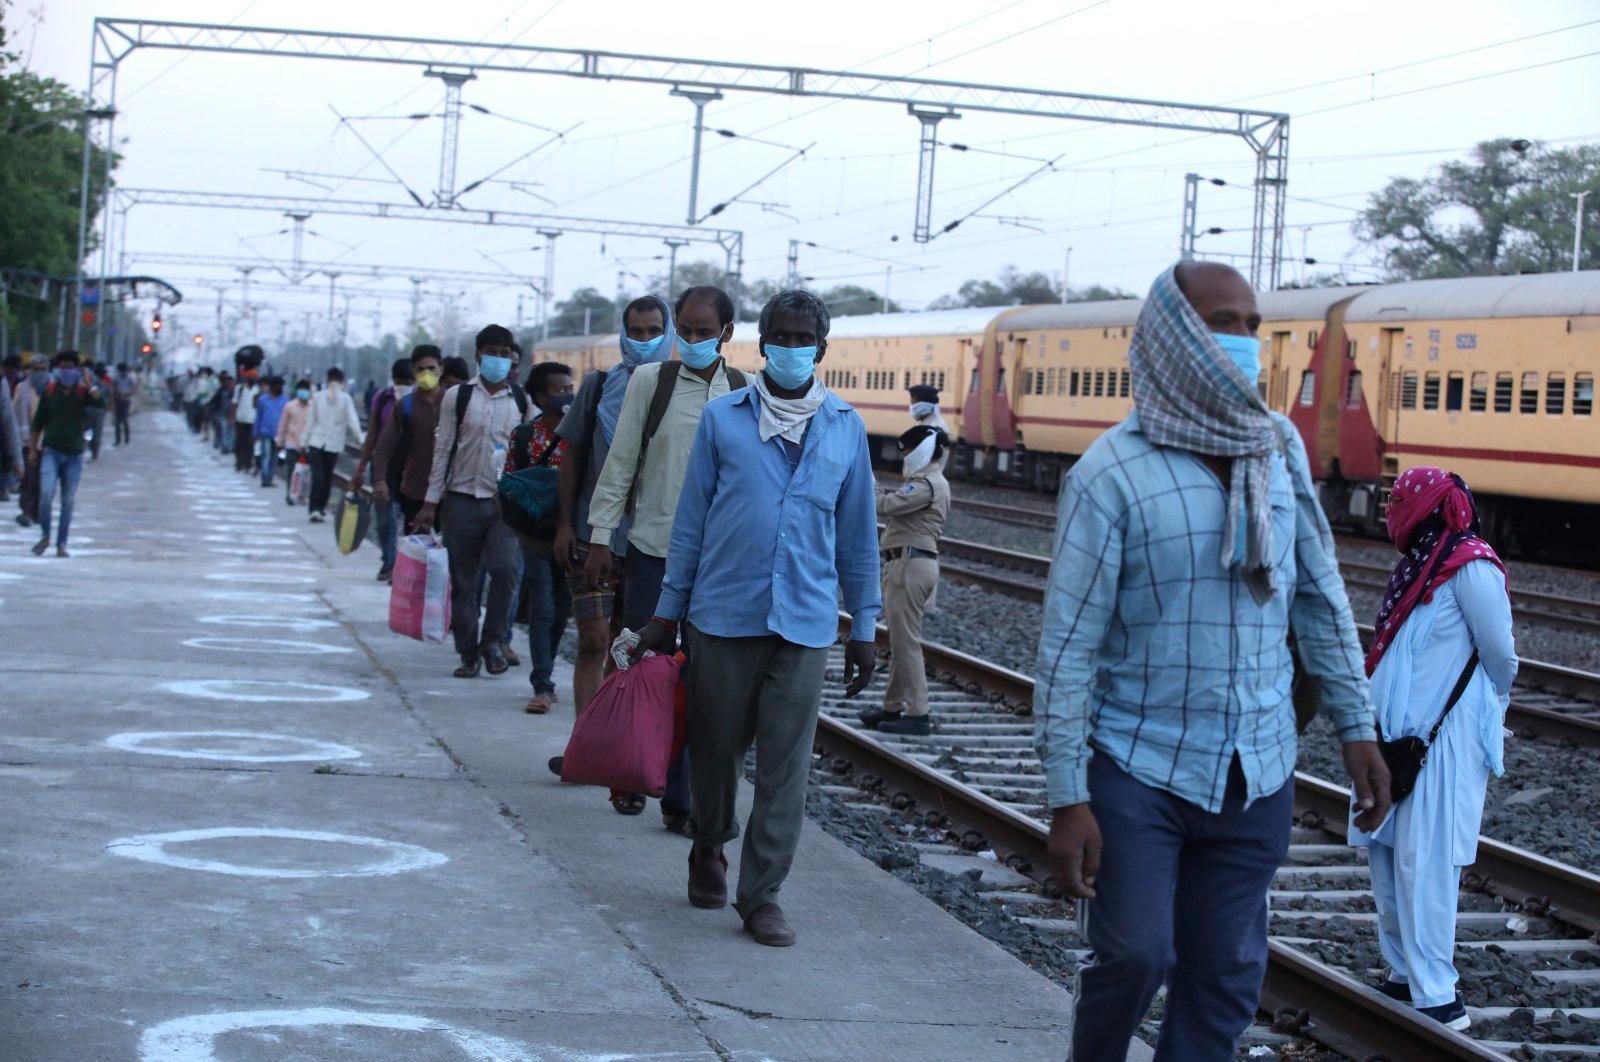 Passengers arrive at Misrod station near Bhopal, India, May 2, 2020. (EPA Photo)